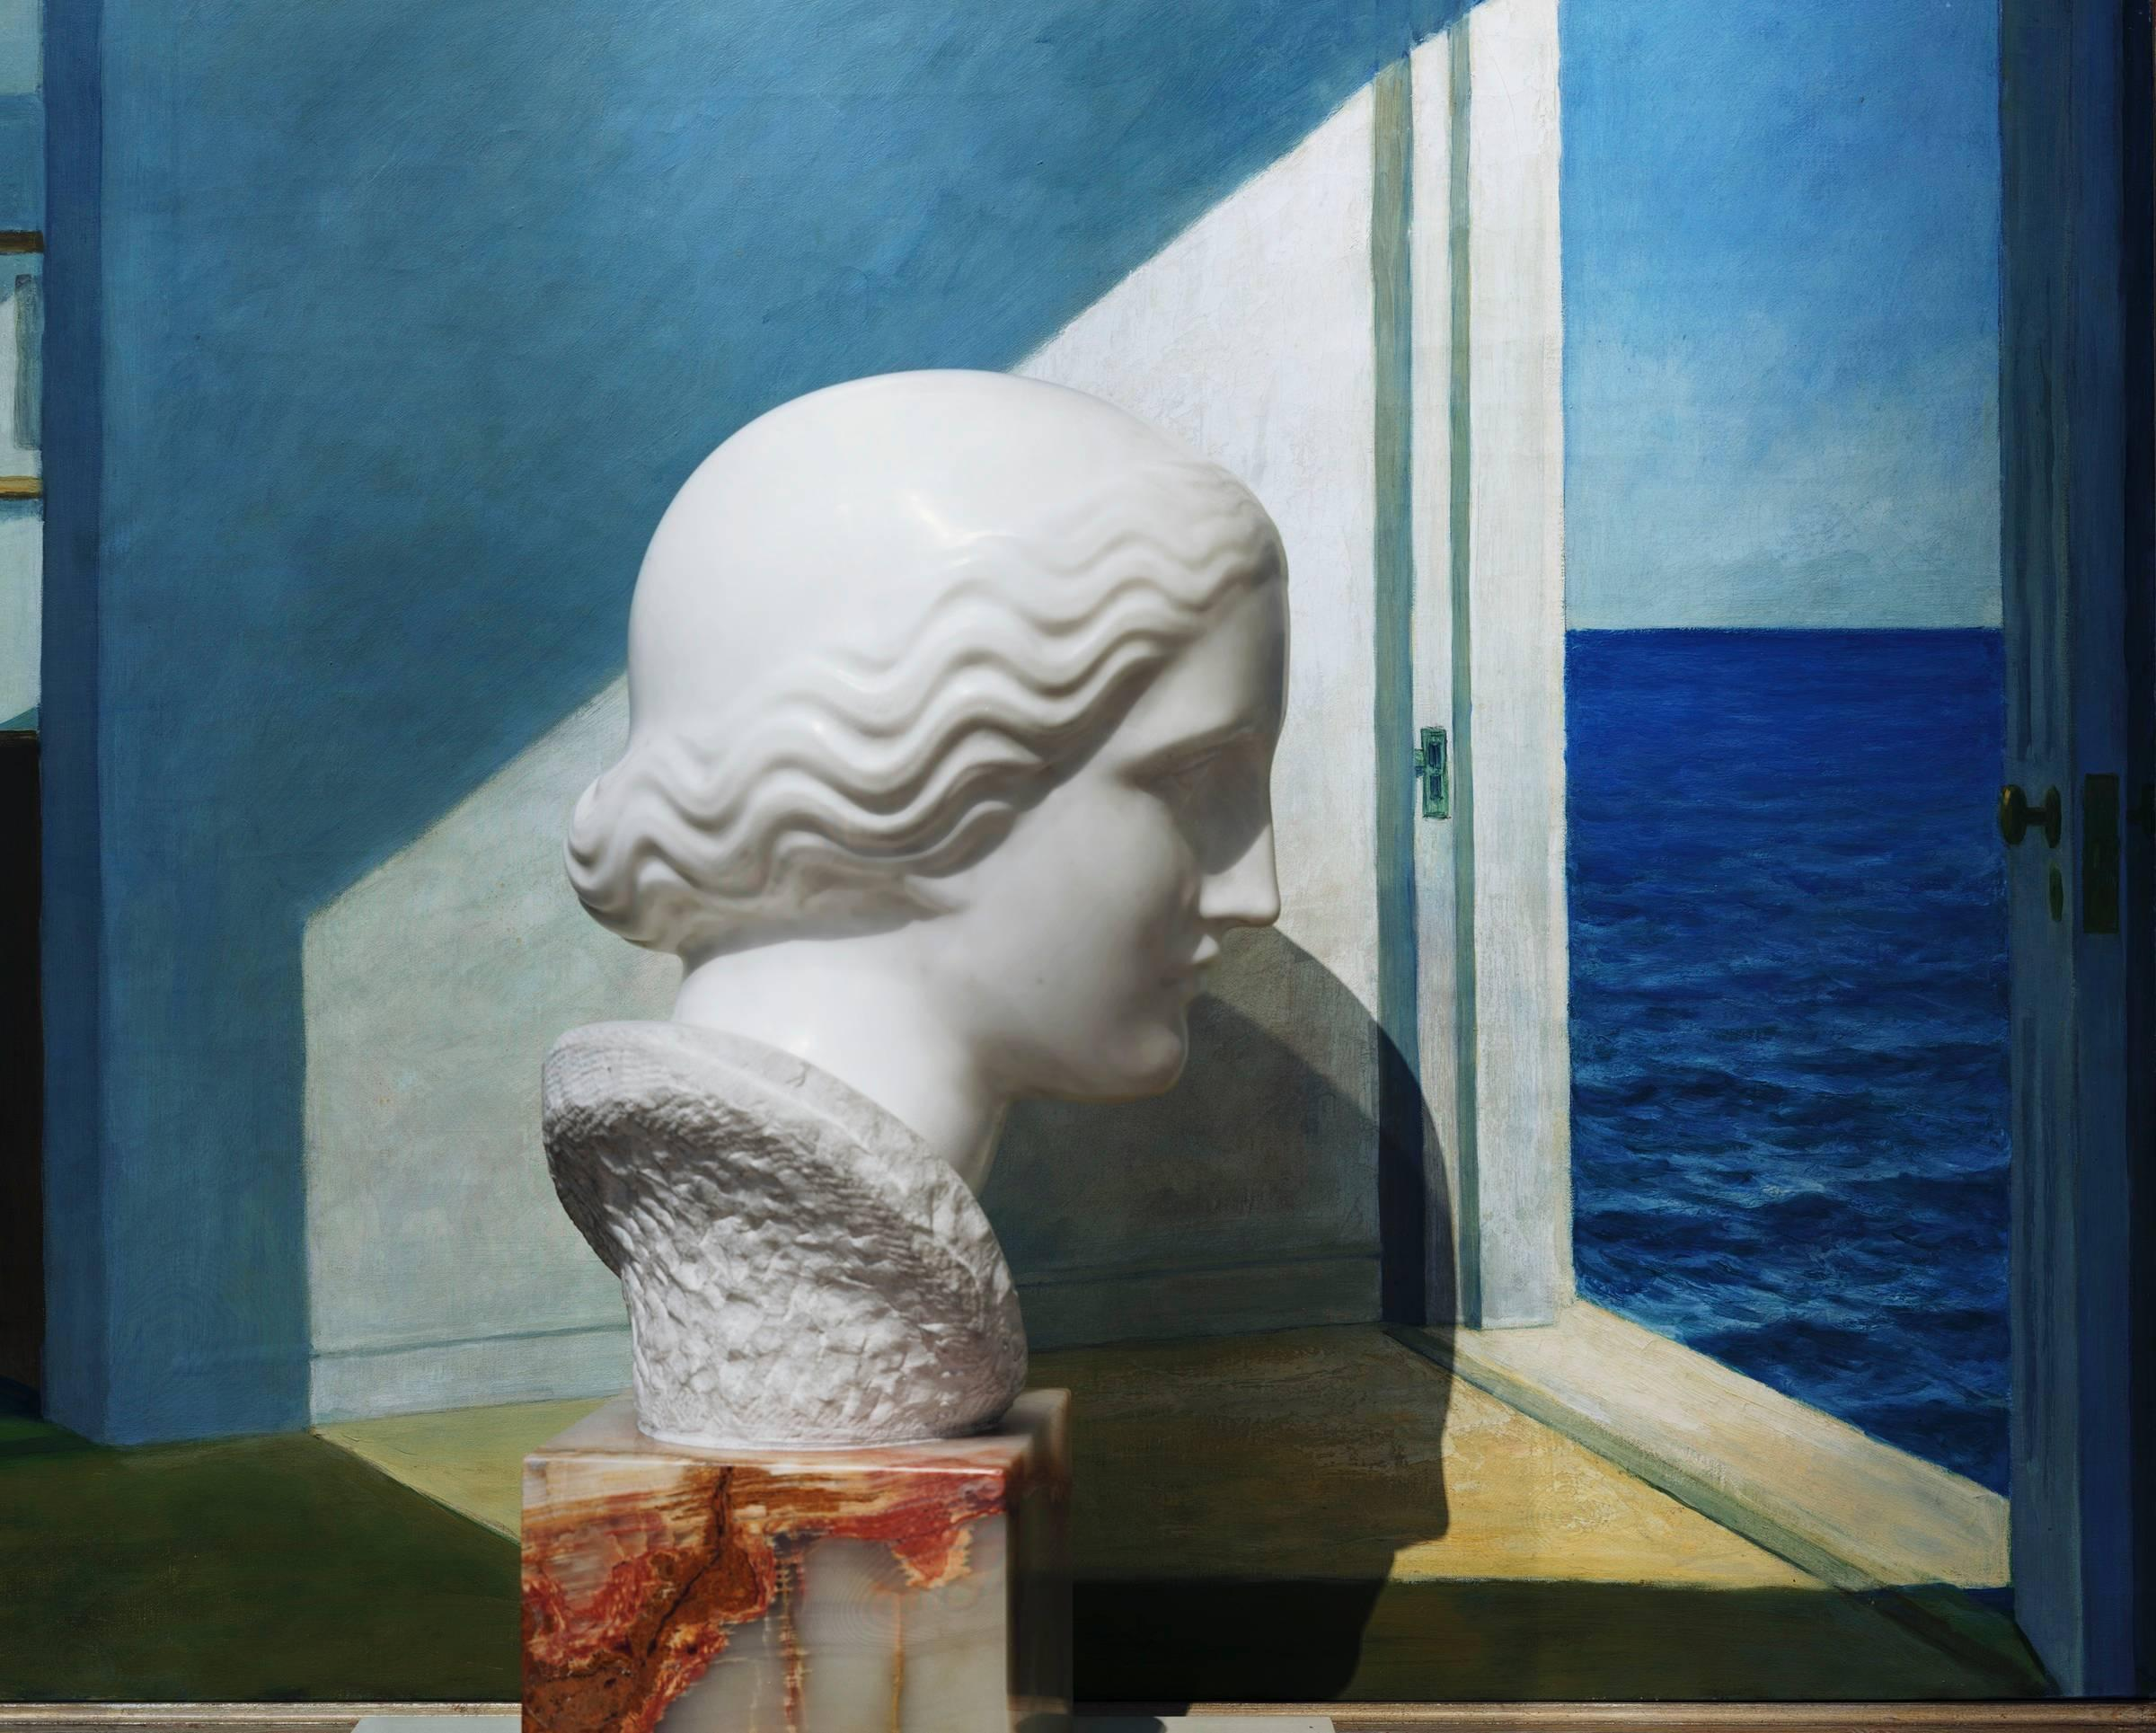 Nadelman/Hopper, Yale University Art Gallery - Abelardo Morell